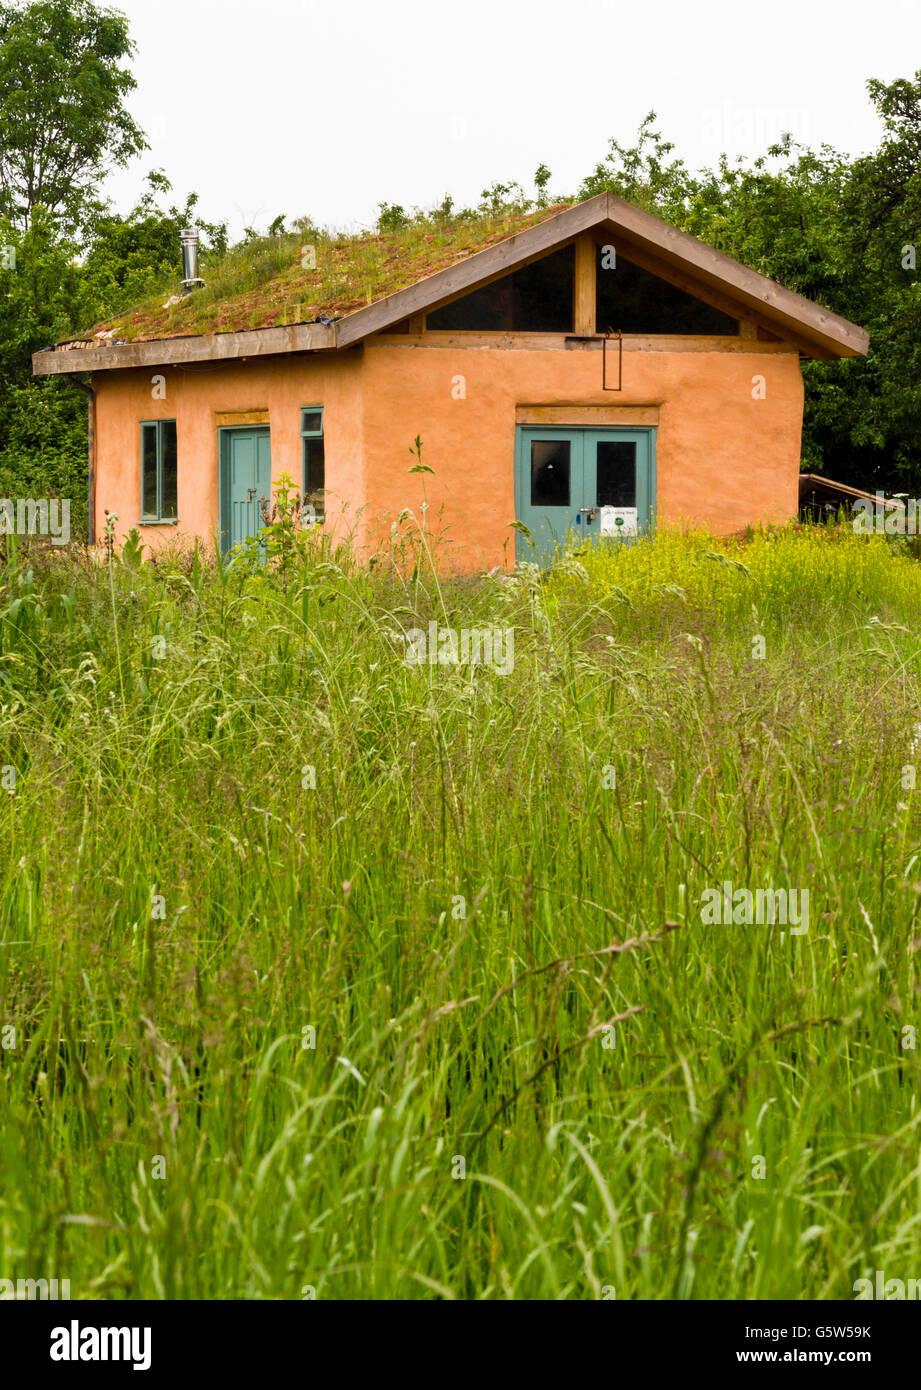 Rustic hut built of natural materials - Stock Image